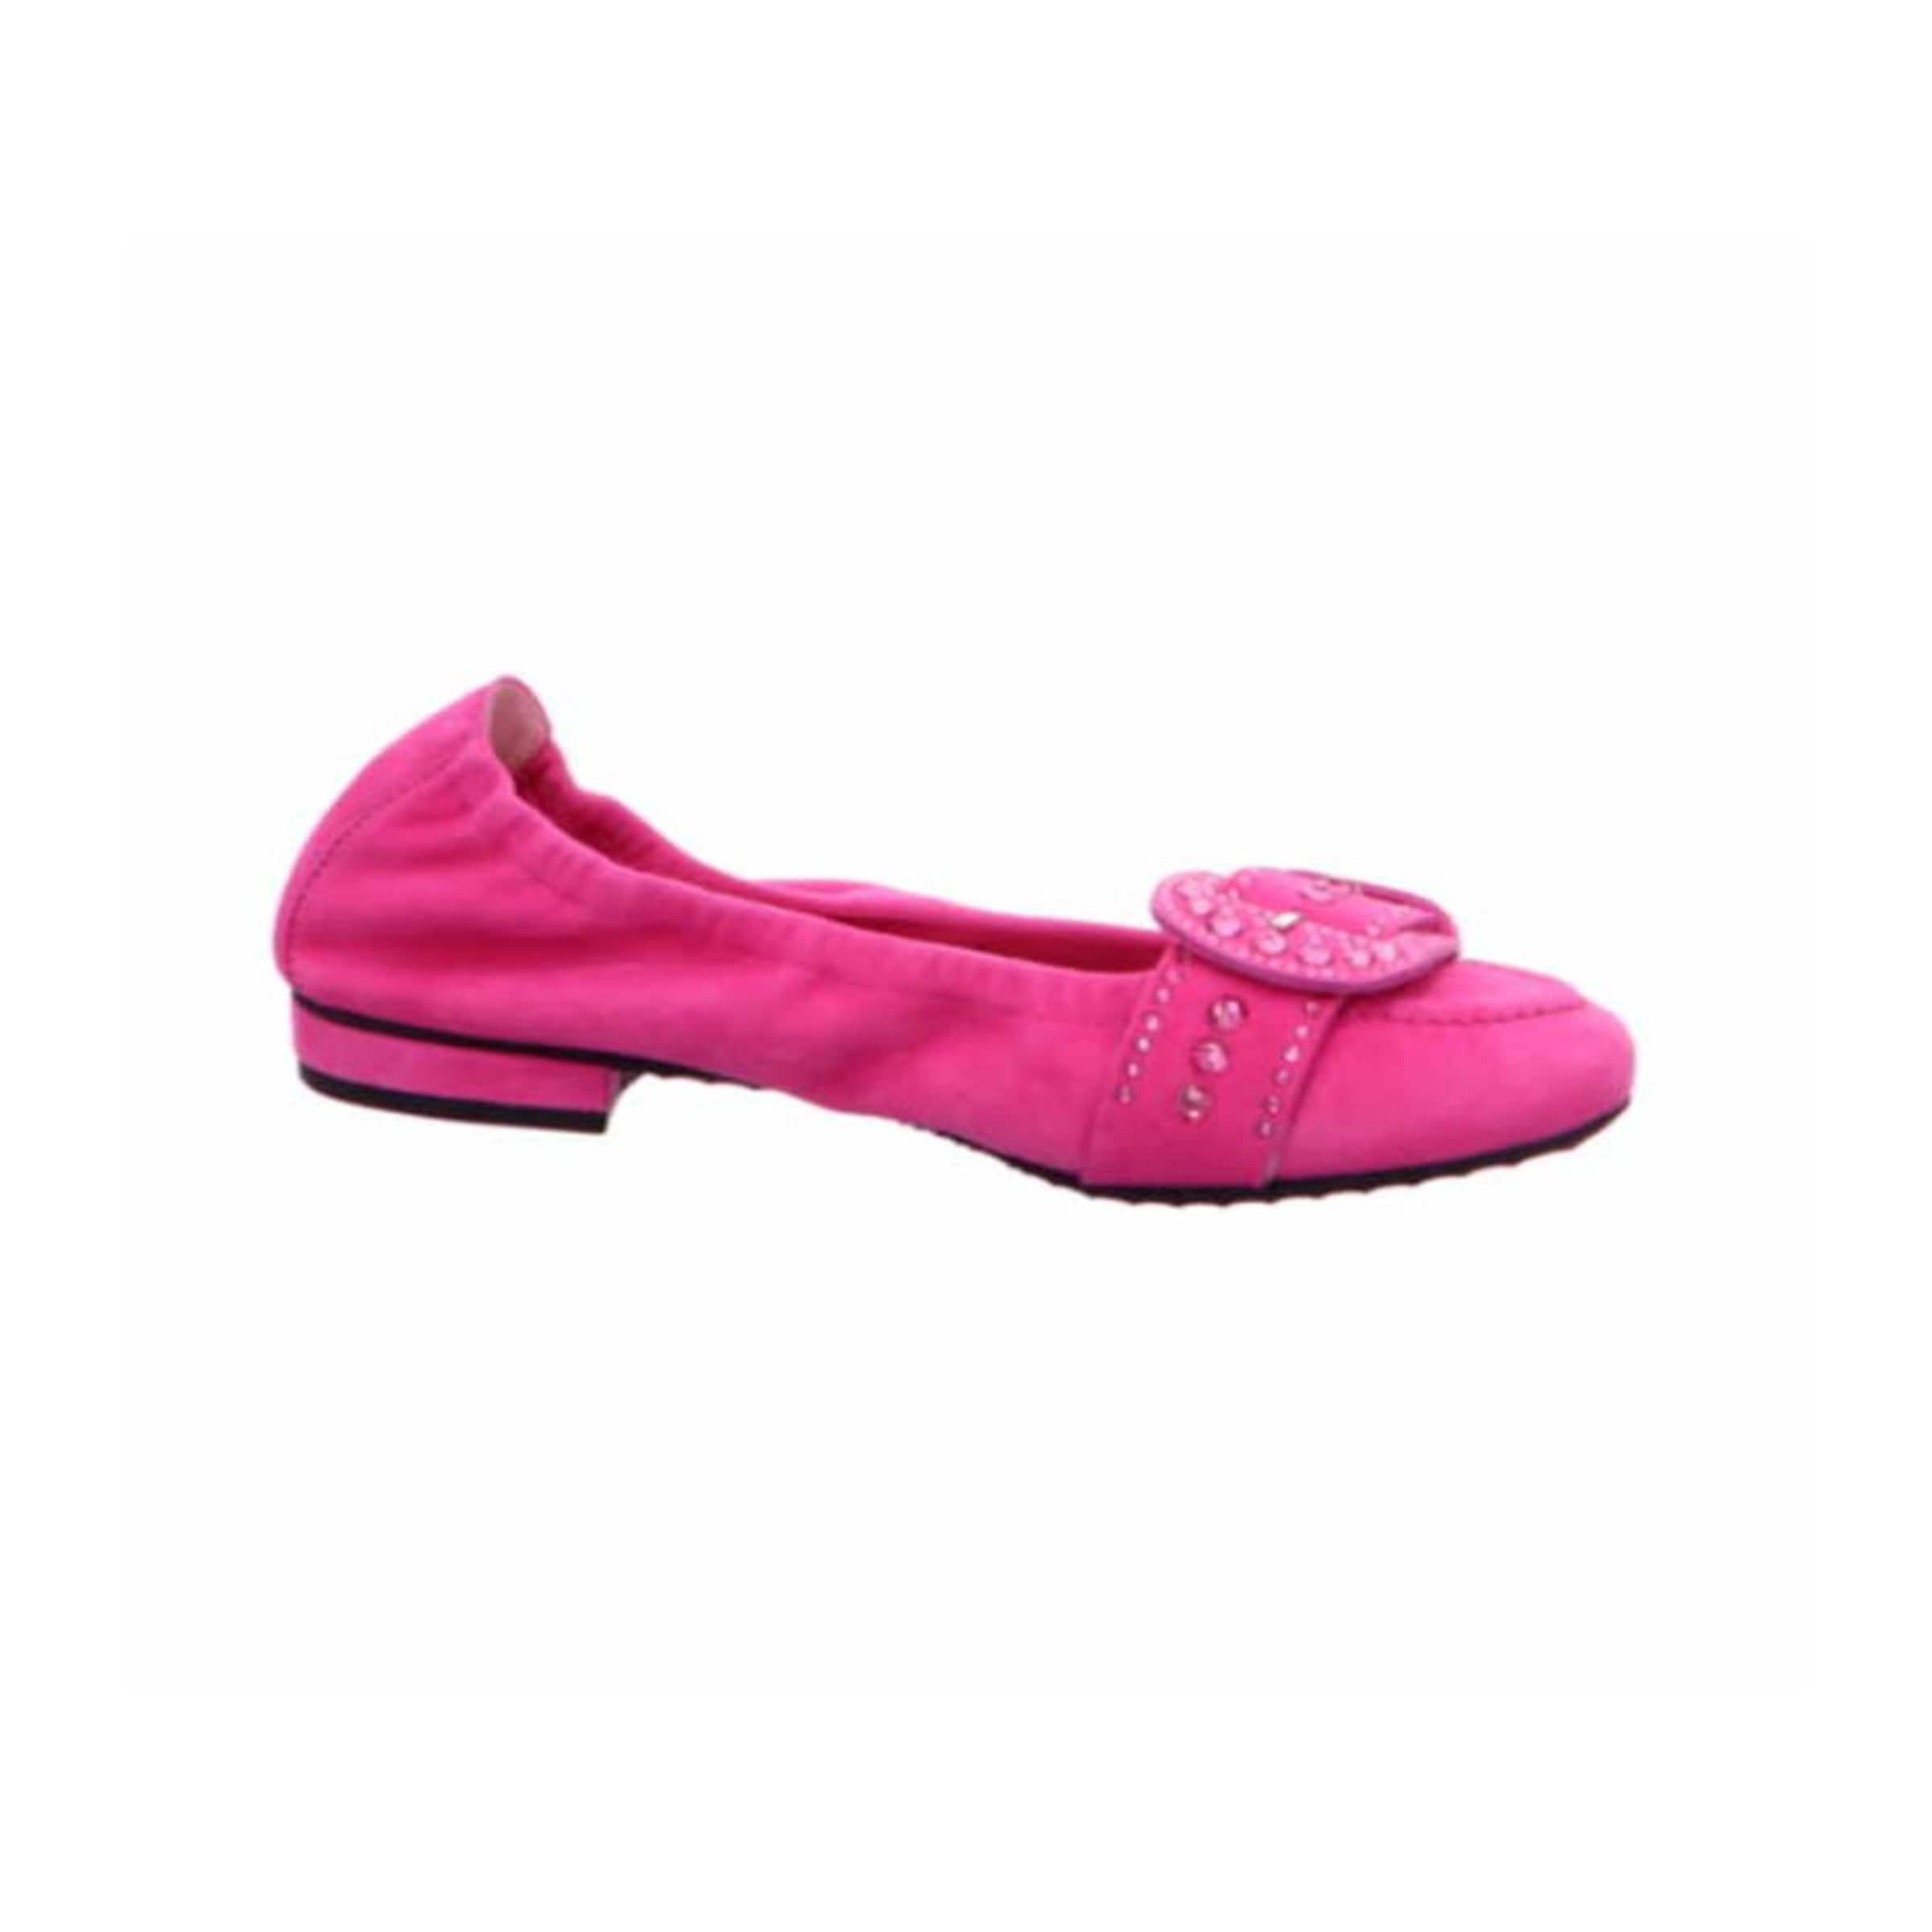 Kennelamp; Ballerinas Schmenger Schmenger In Pink Kennelamp; E2DH9I